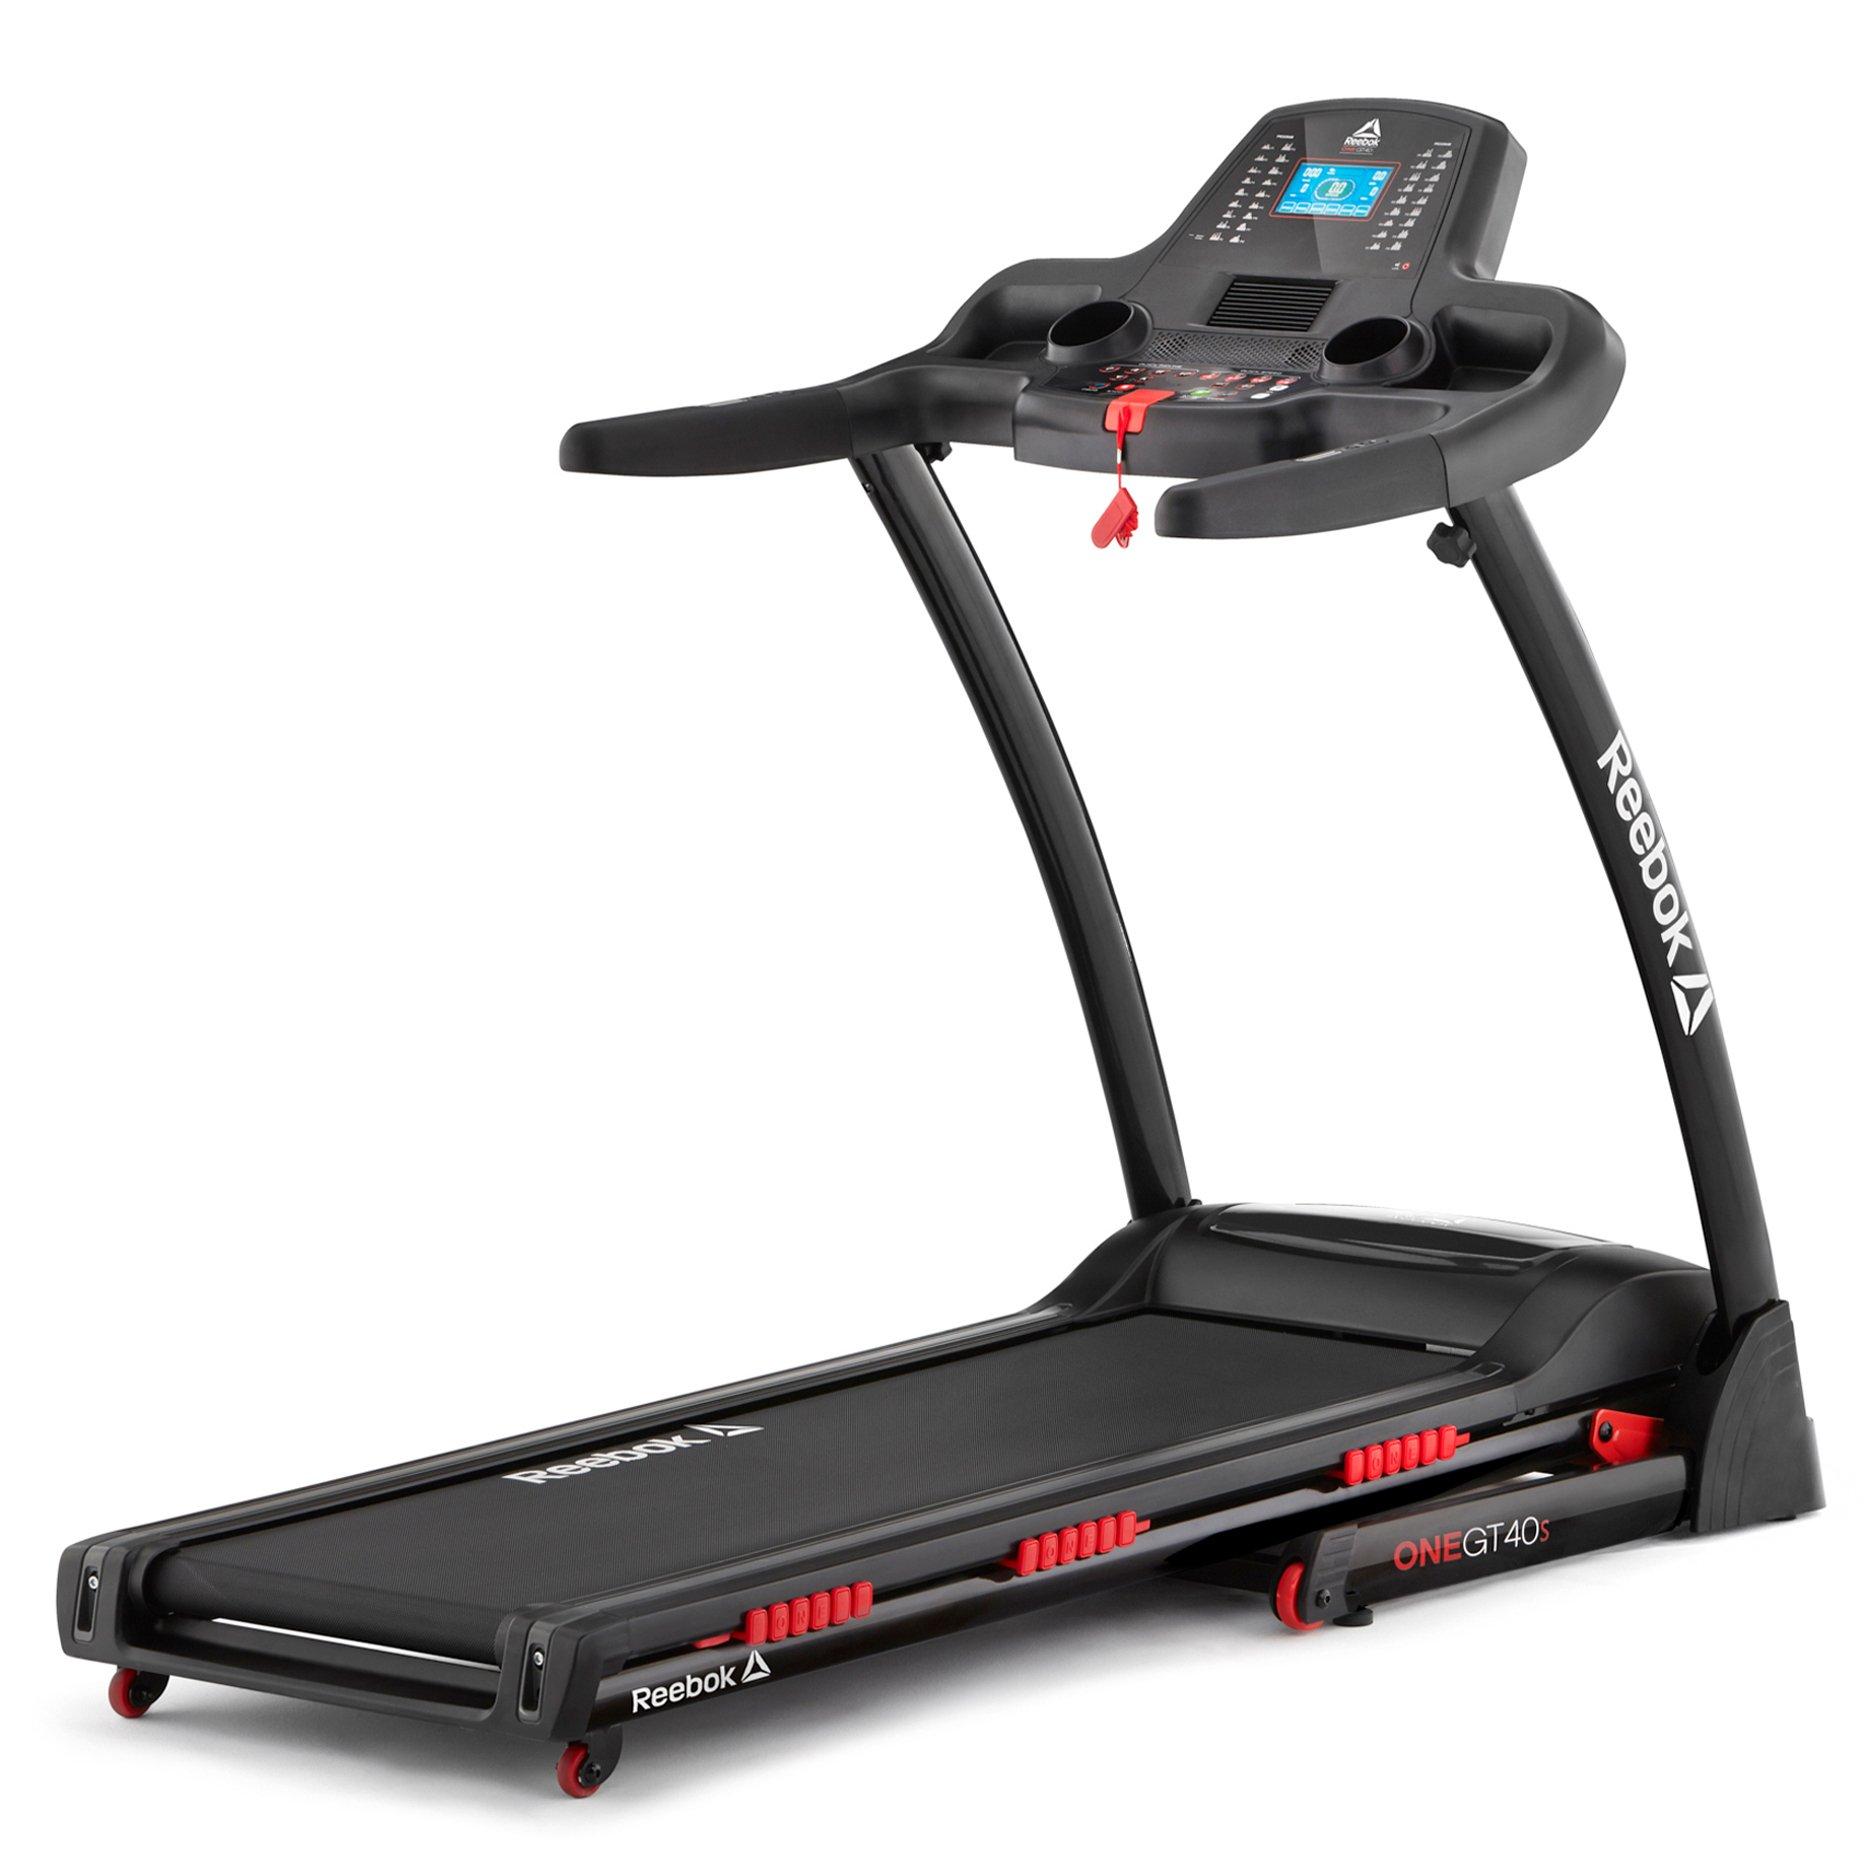 'Reebok One Gt40s Treadmill